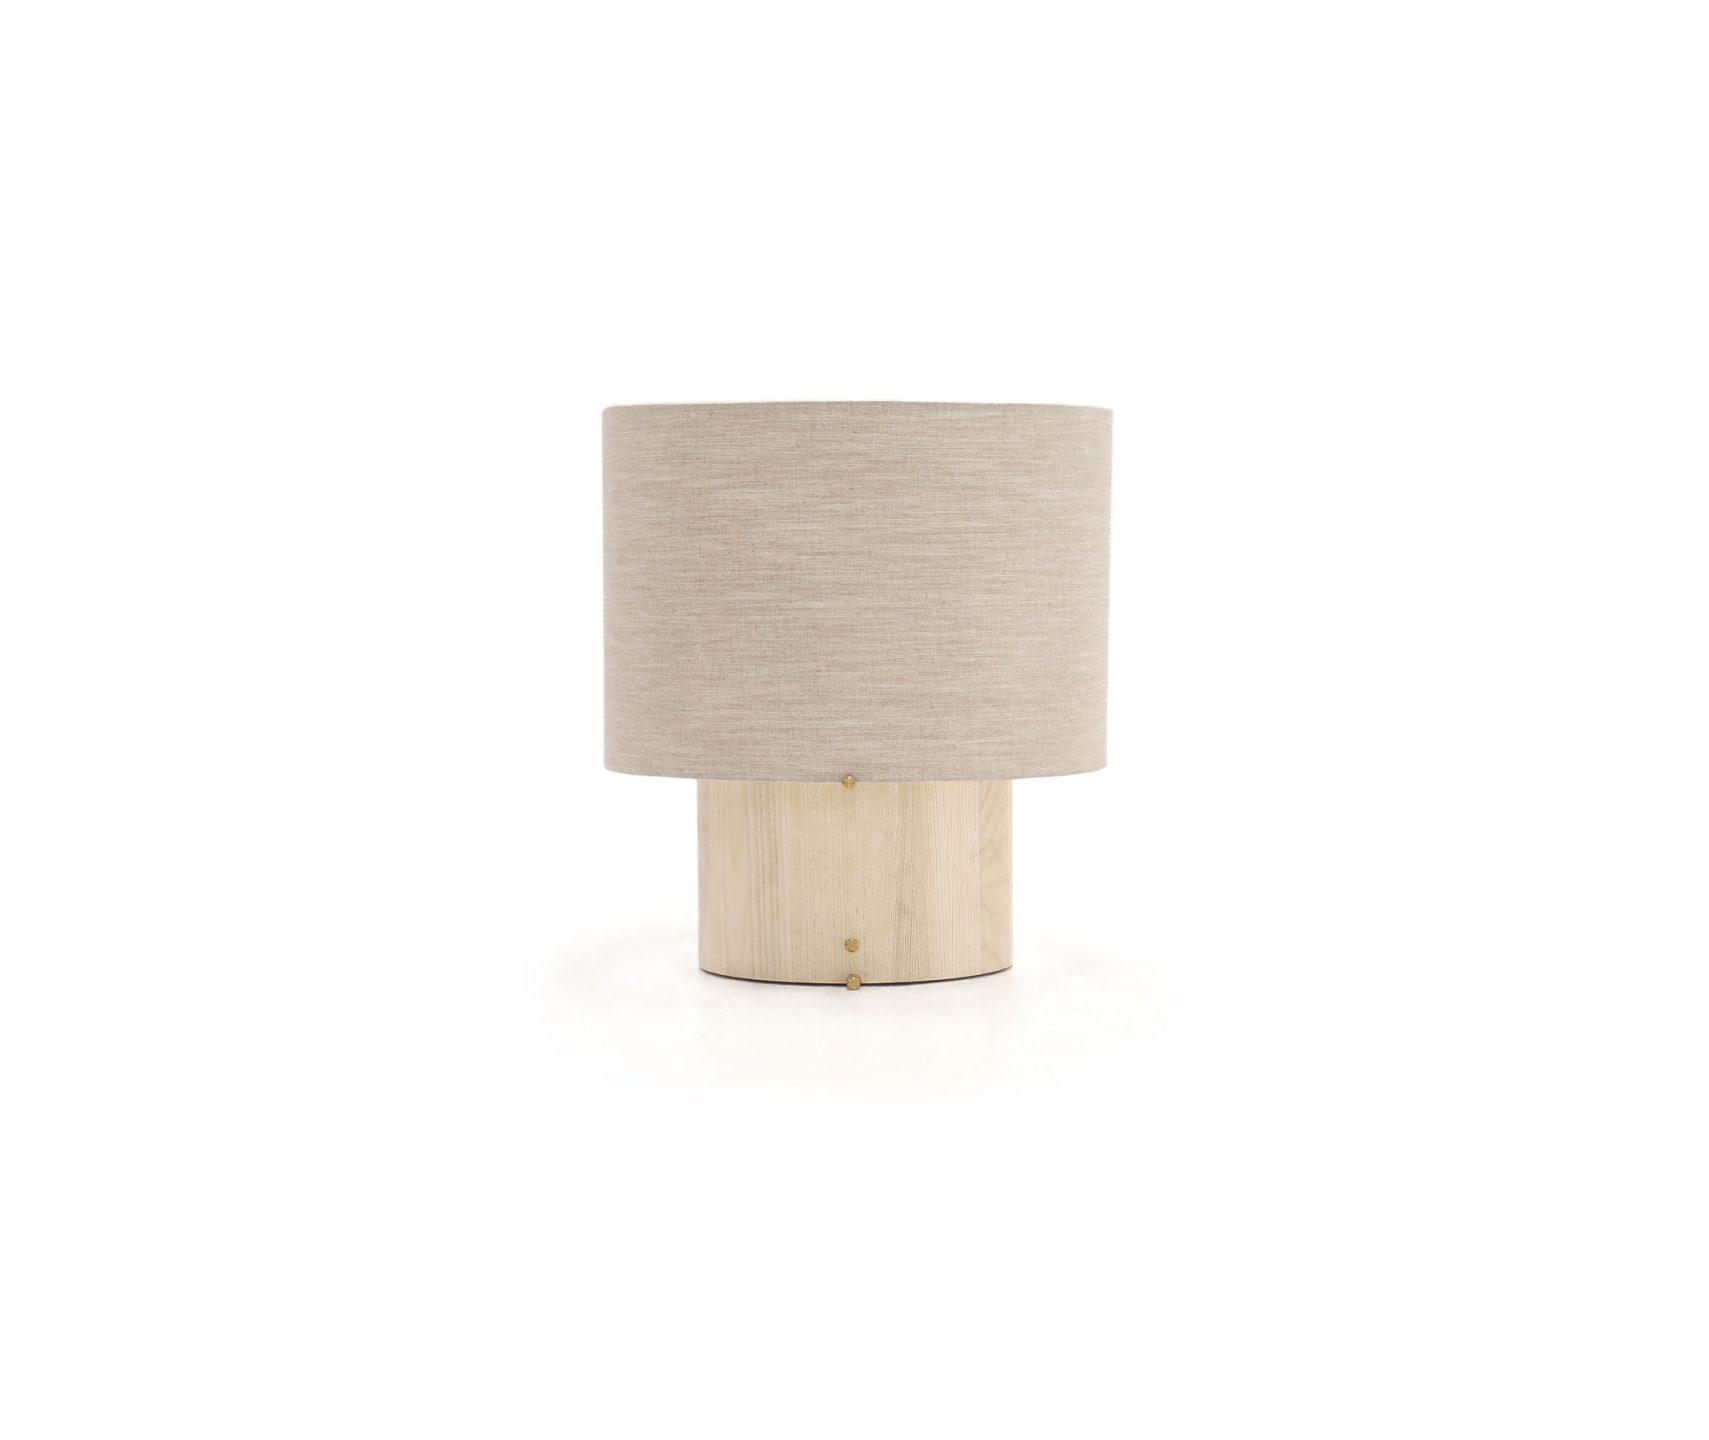 Verellen_Bobbio-Table-Lamp_int_products